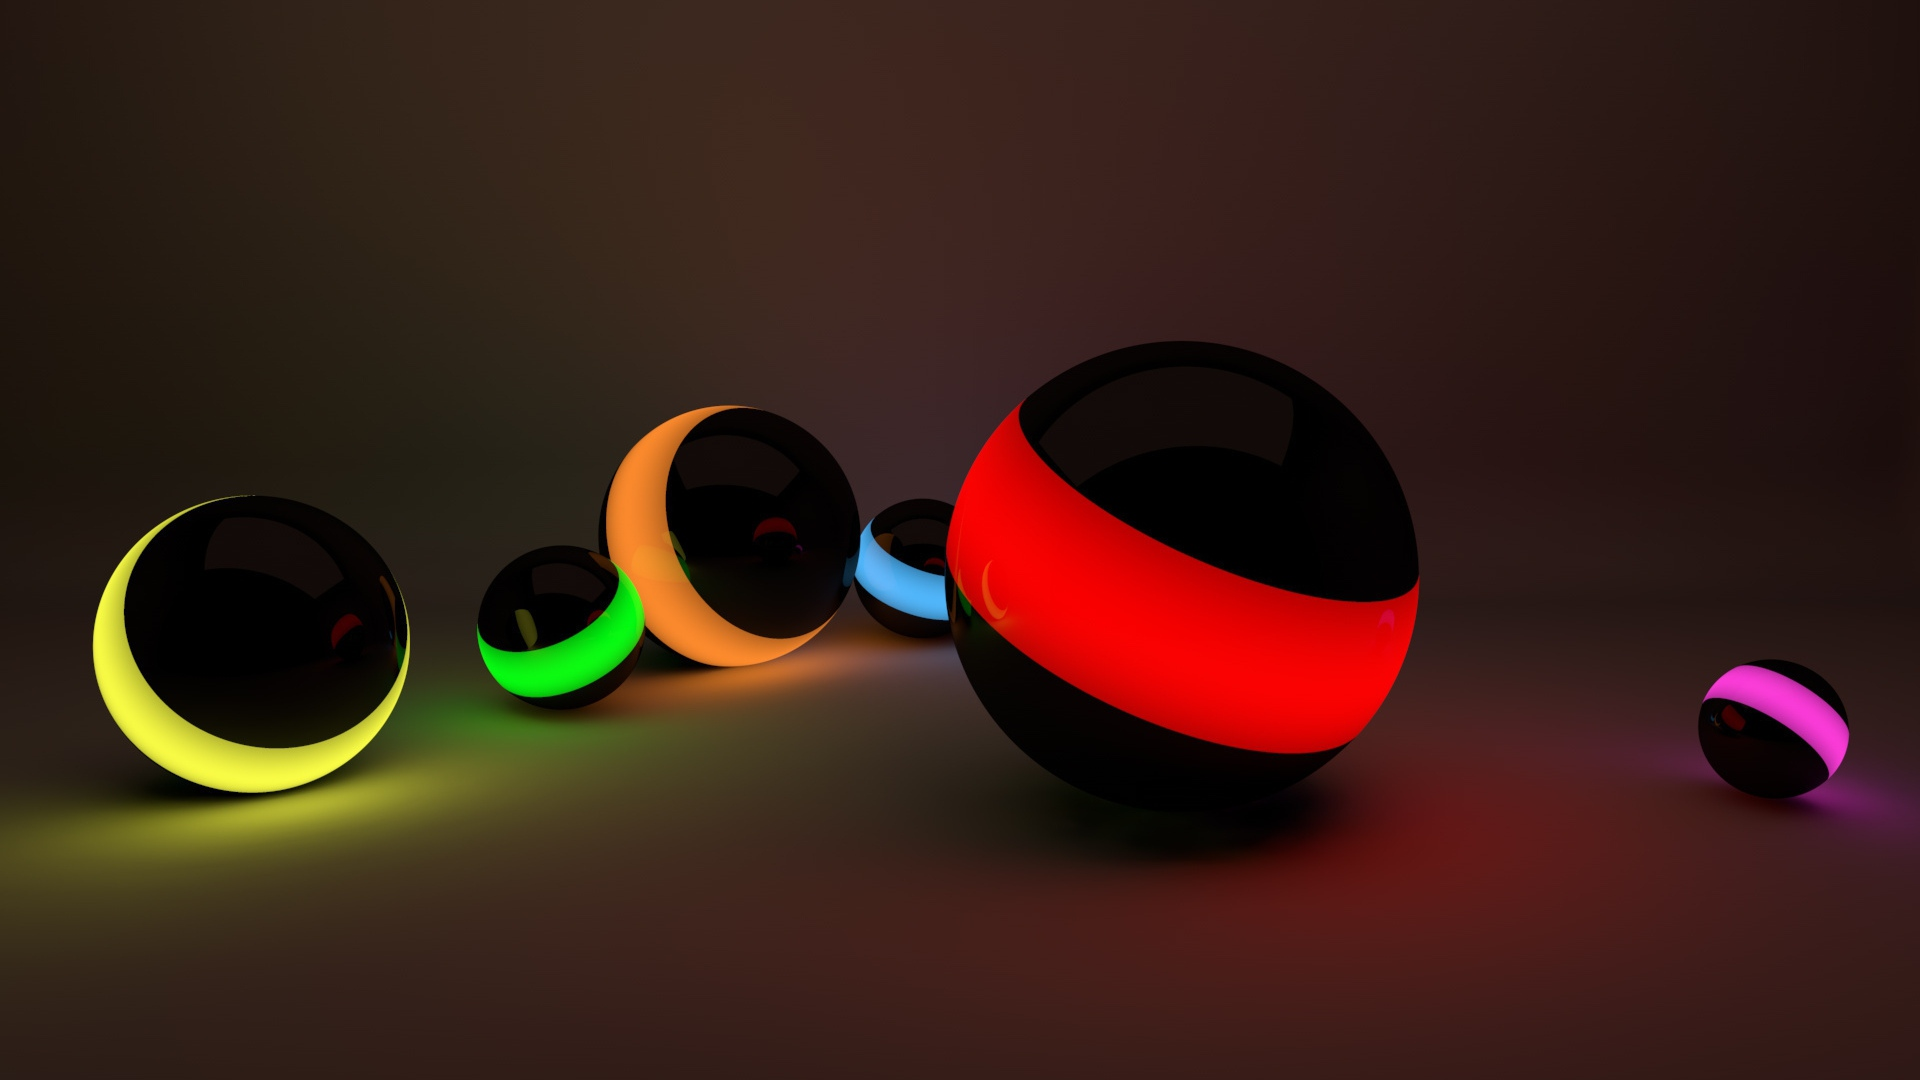 download wallpaper 1920x1080 balls, lines, neon lights full hd